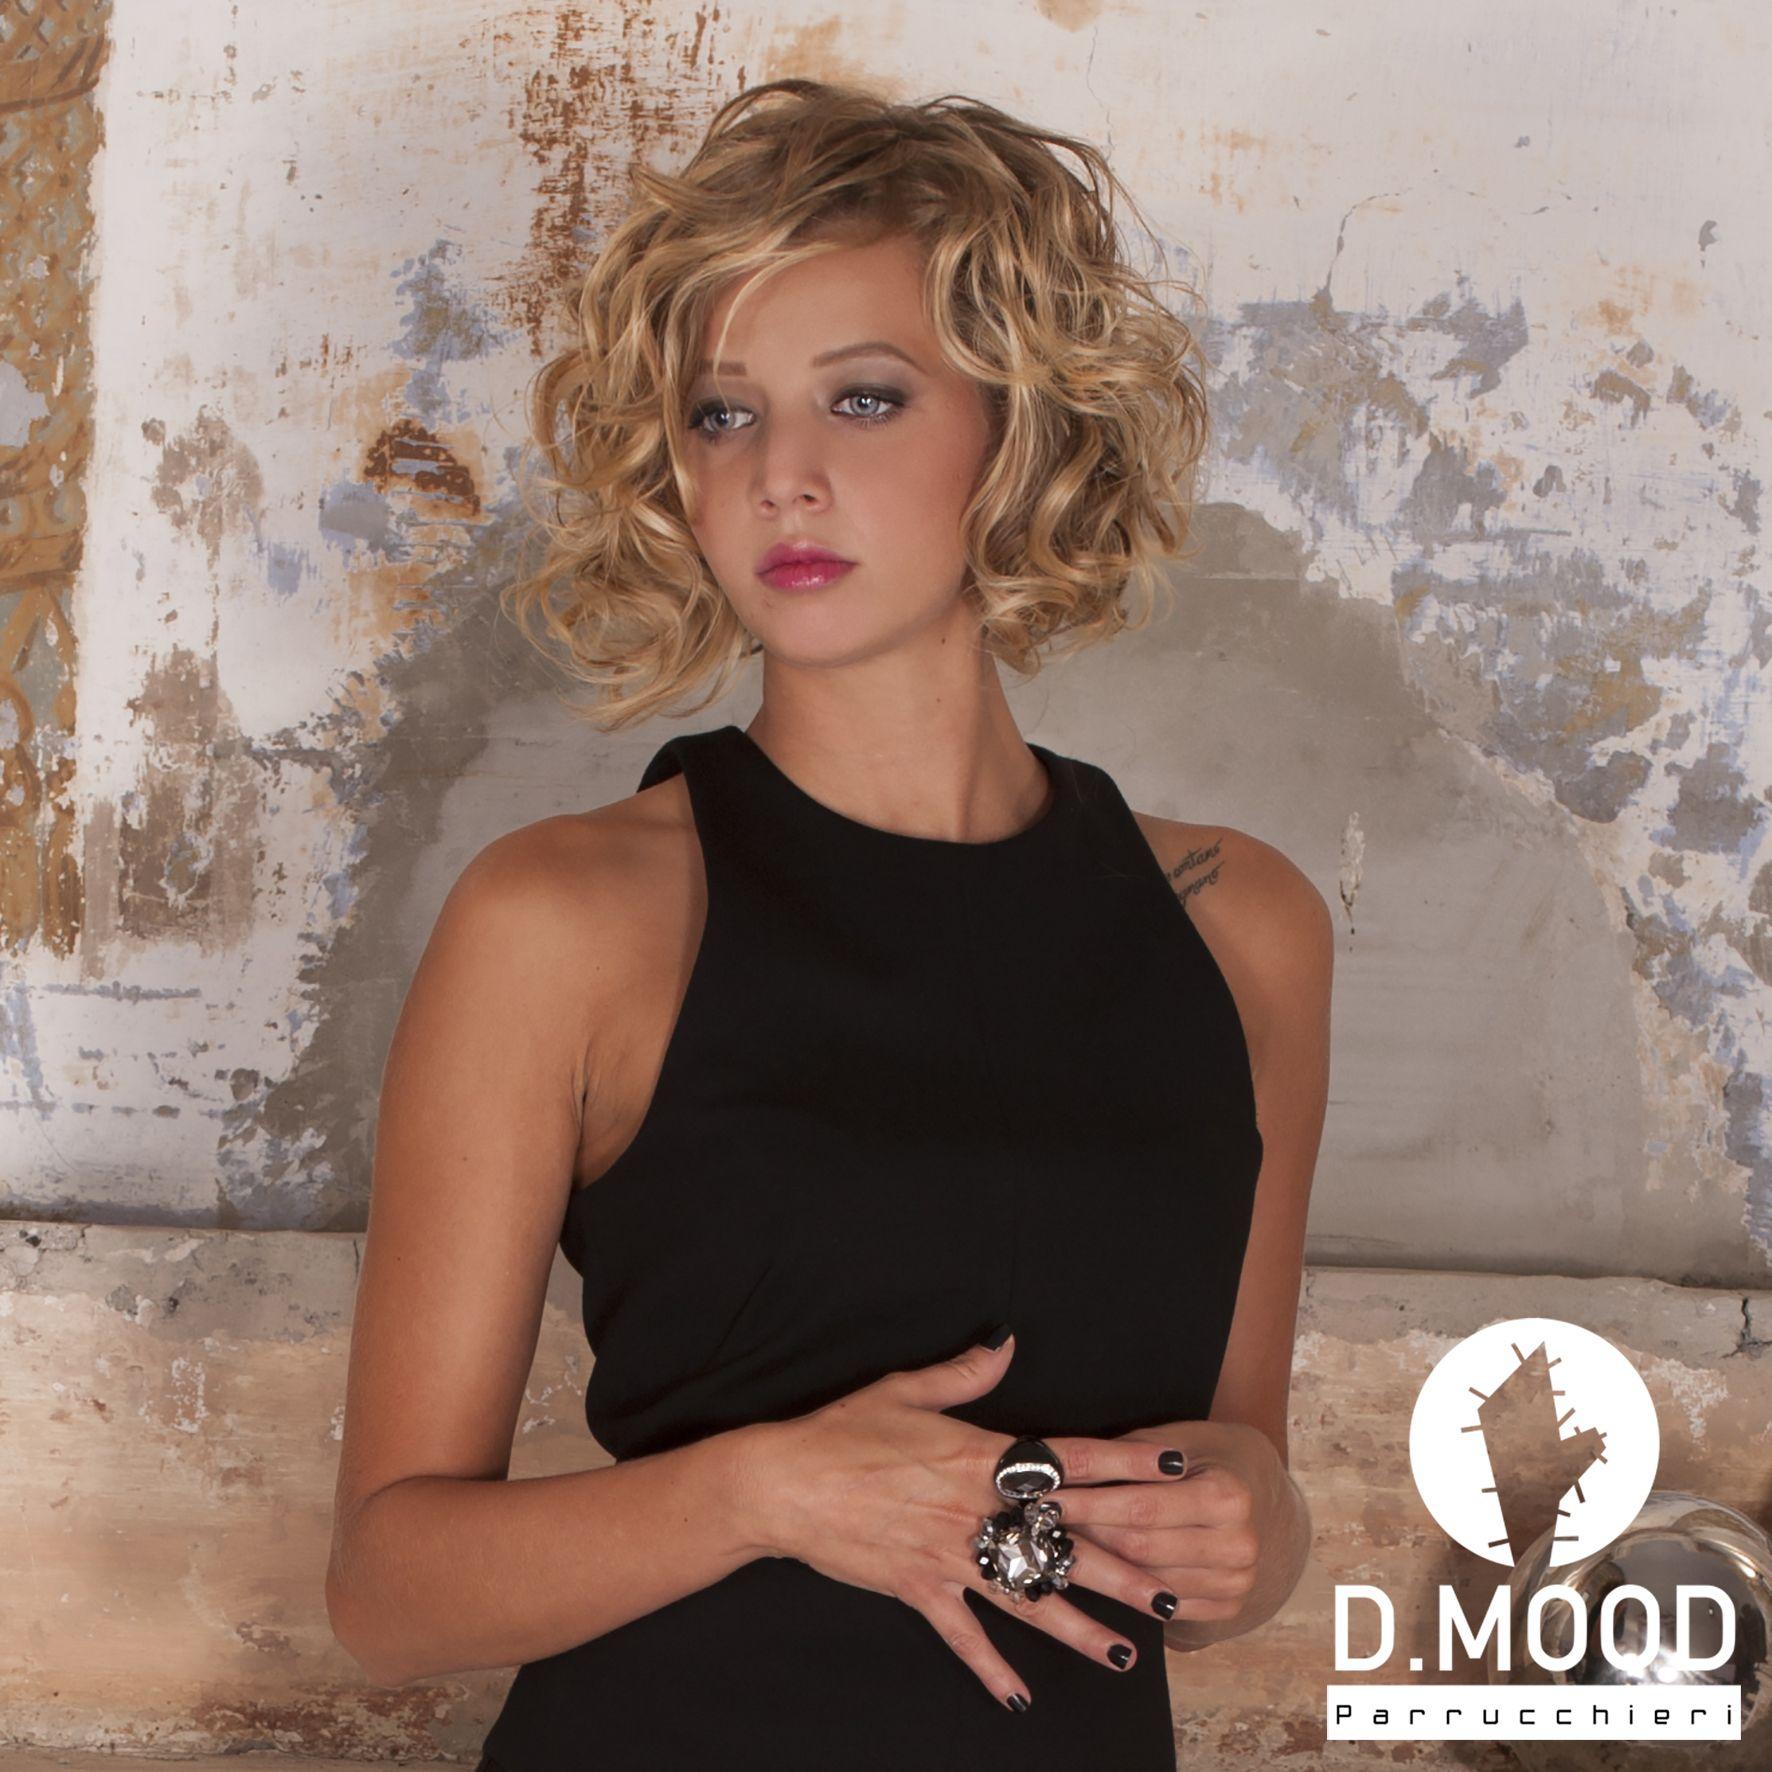 www.dmoodparrucchieri.com #hair #shortcut #curl # ...